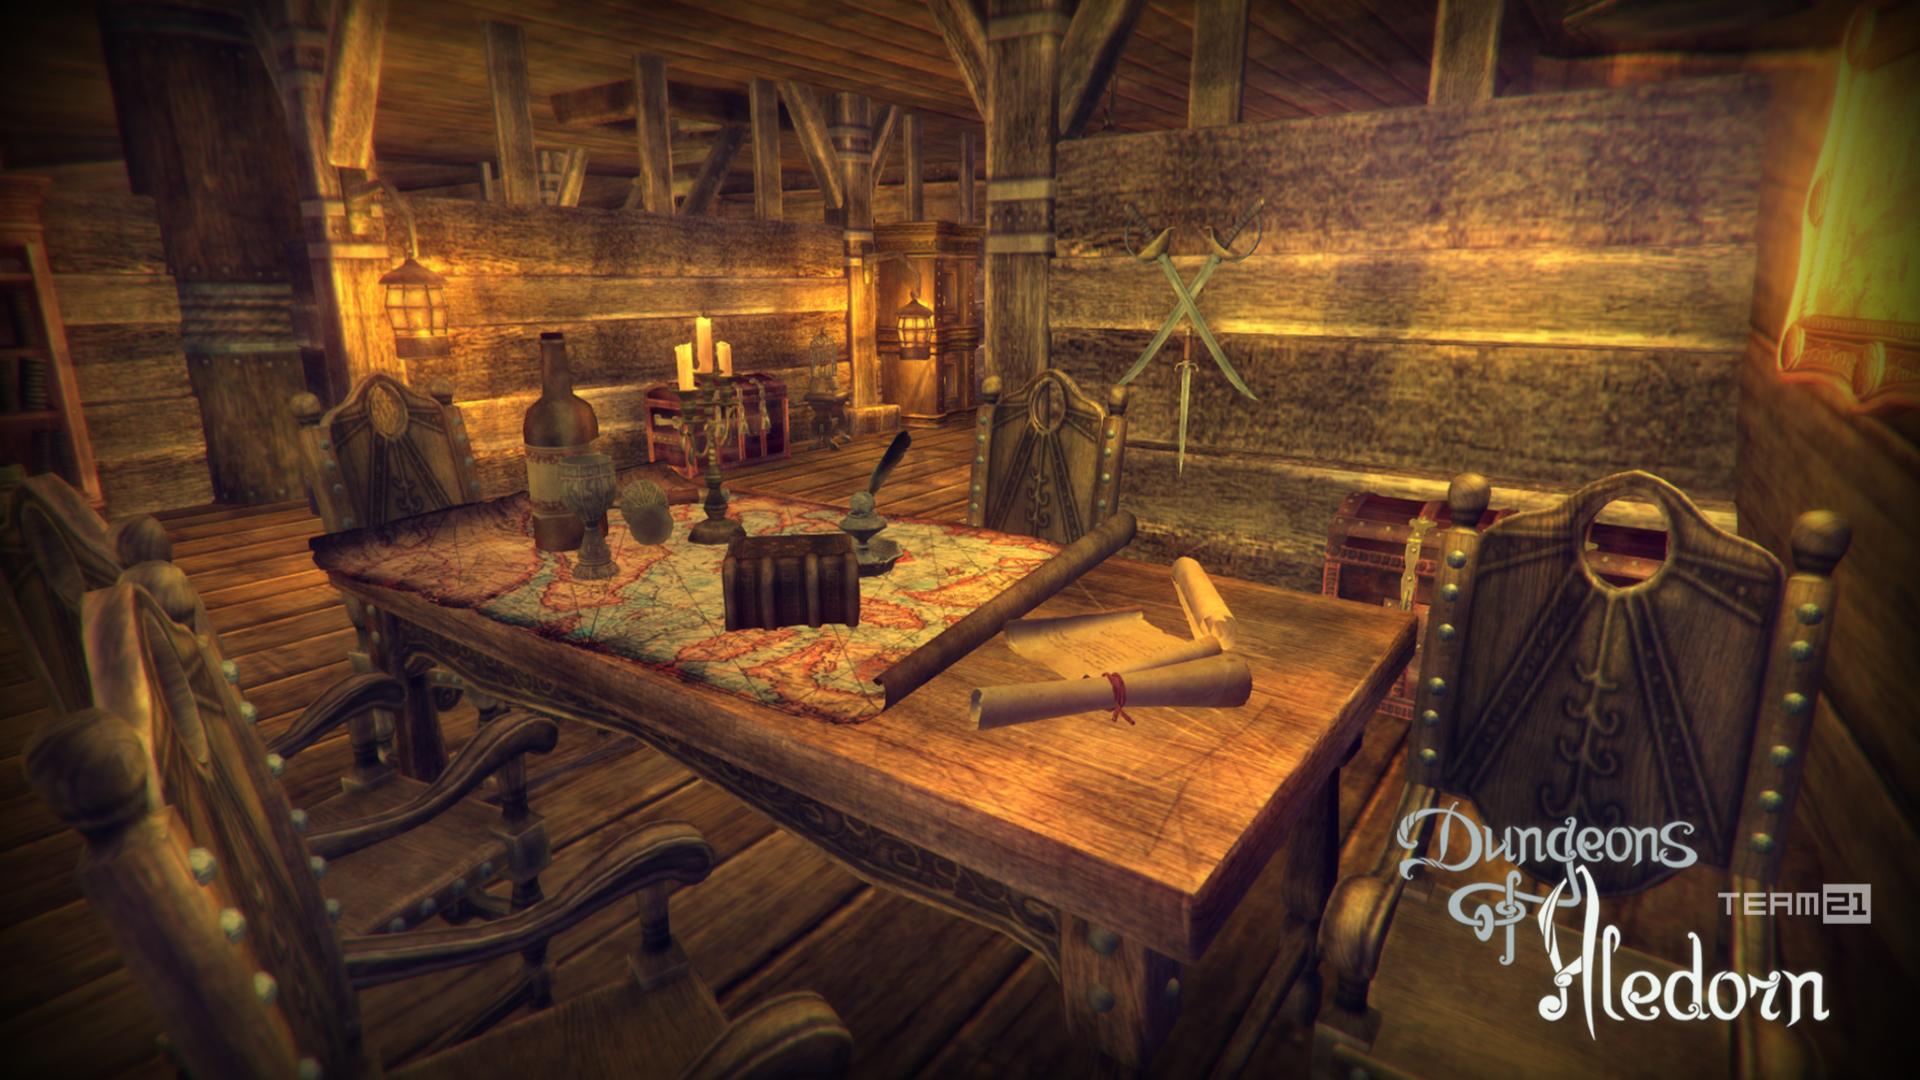 Dungeons Of Aledorn Reached 50% Of Its Target Goal On Kickstarter